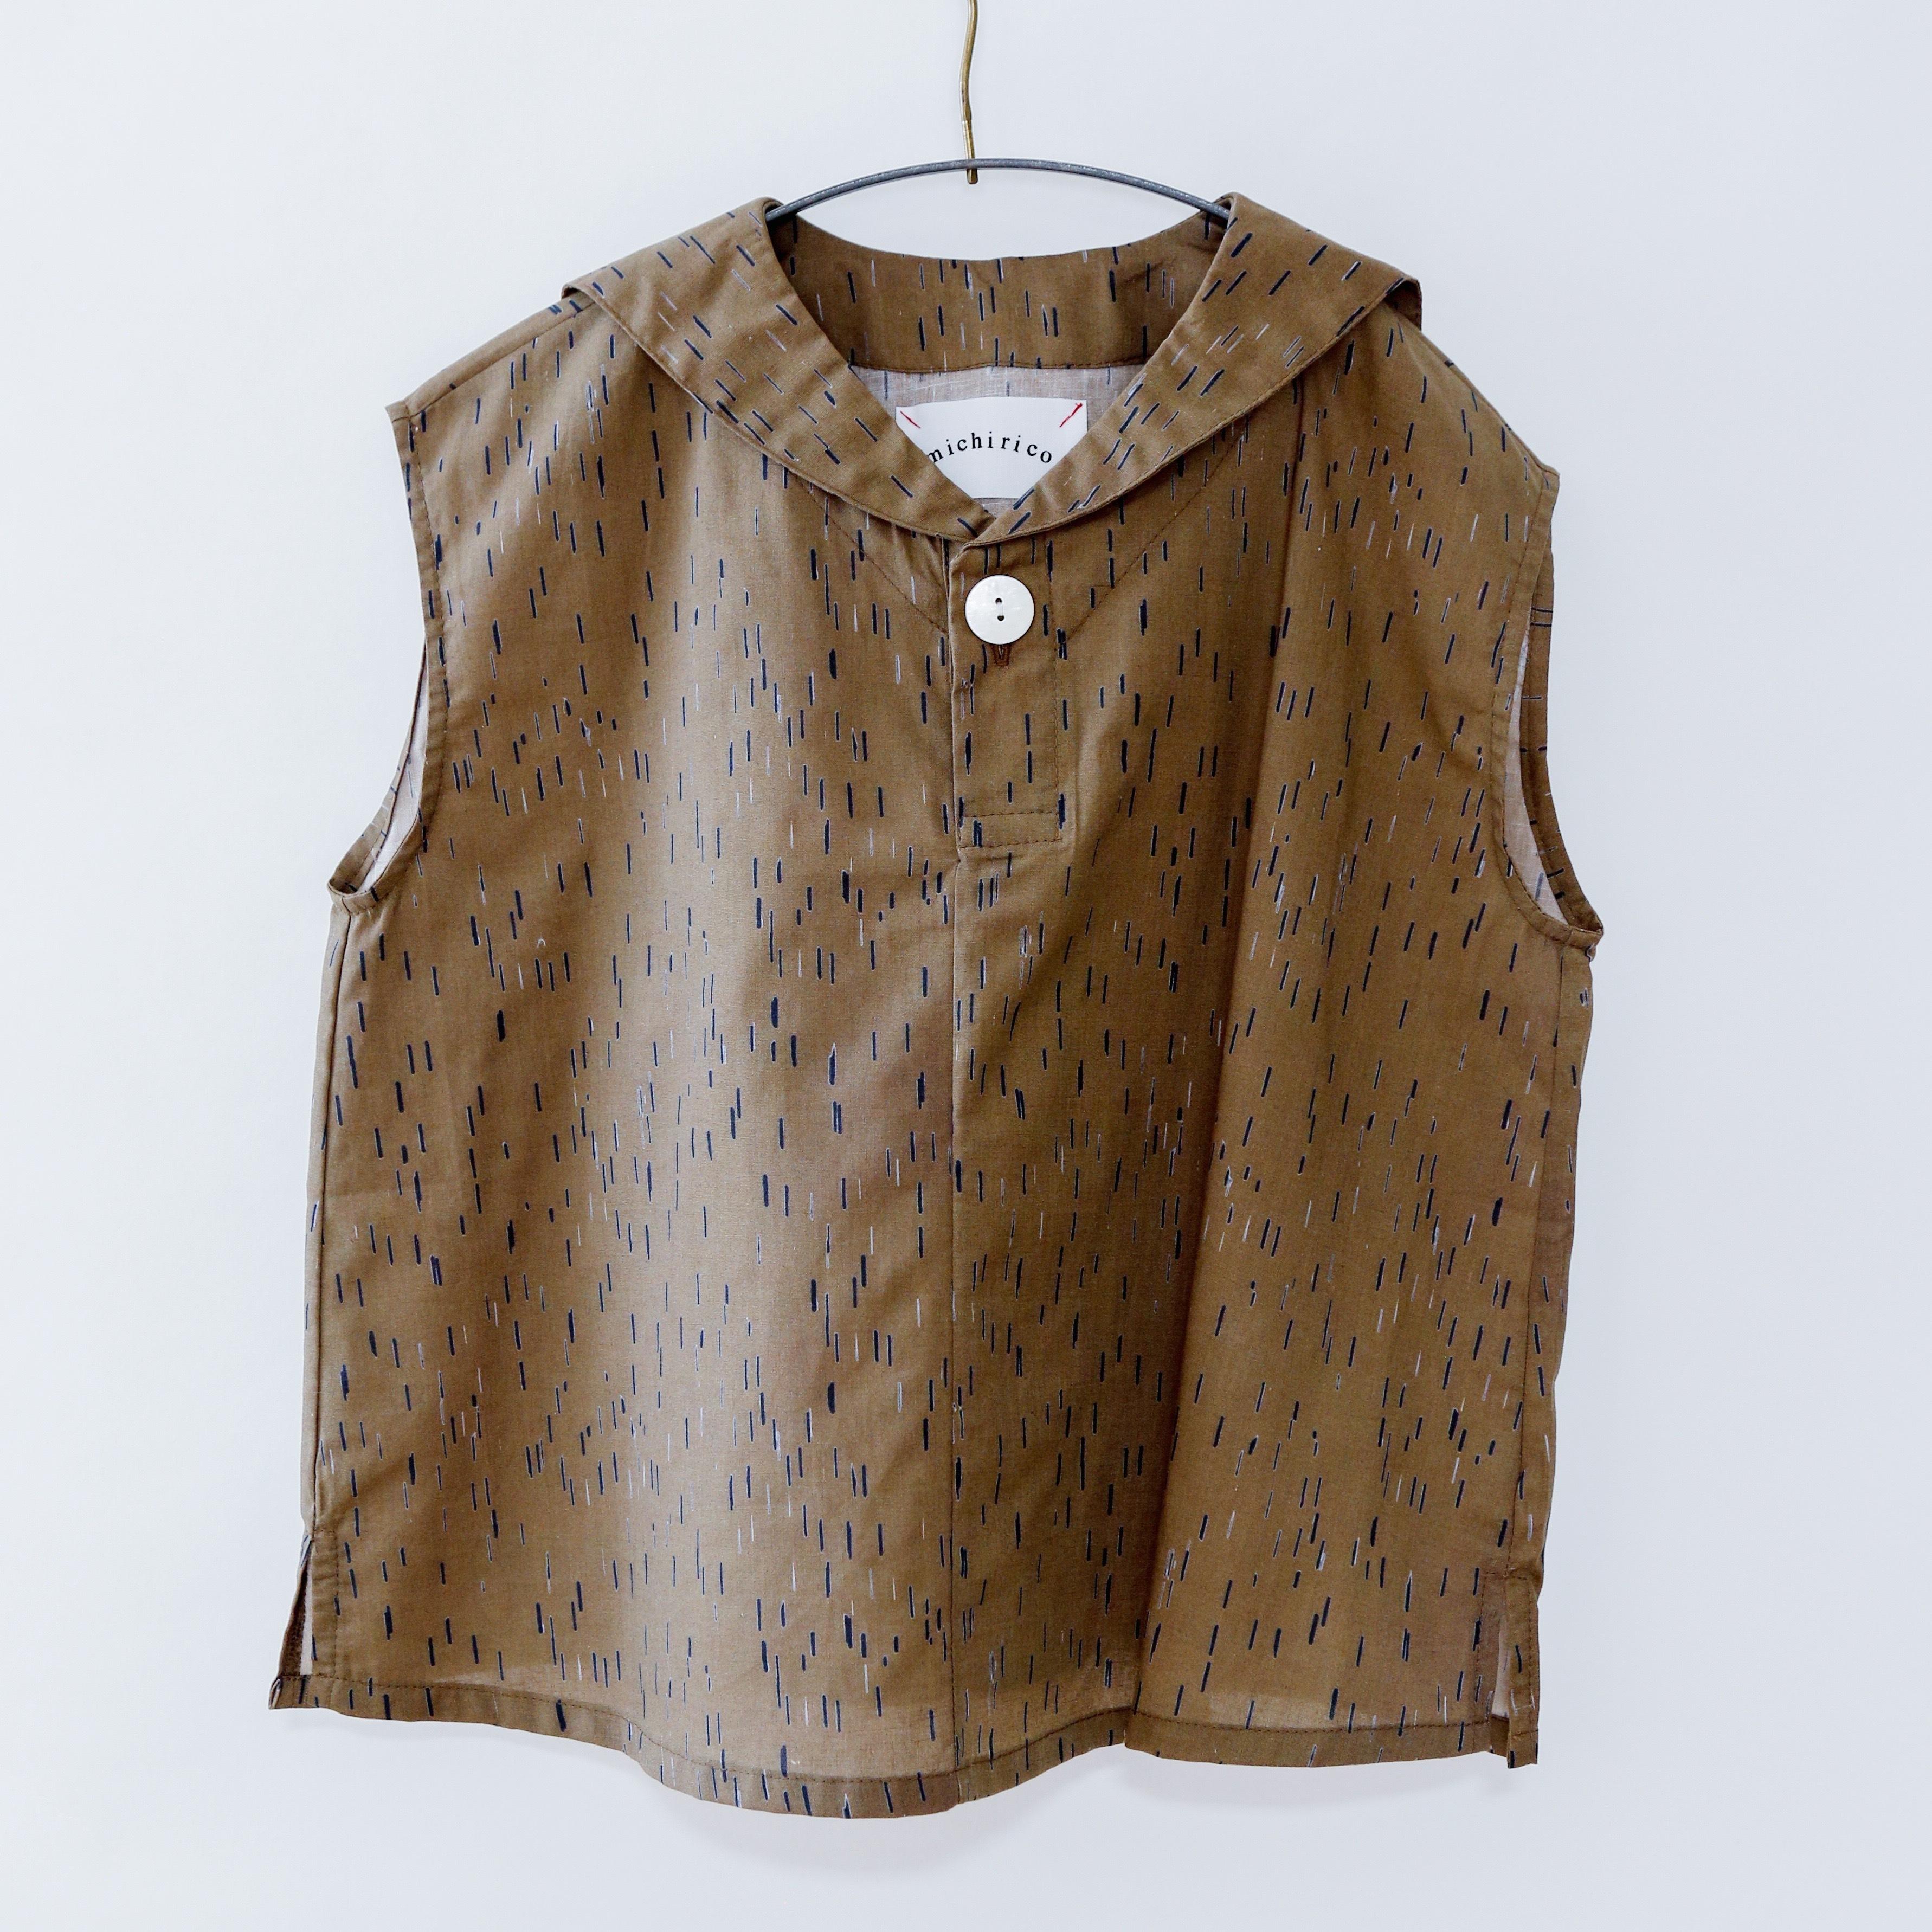 《michirico 2020SS》Sailor shirt / mocha / L・XL・XXL